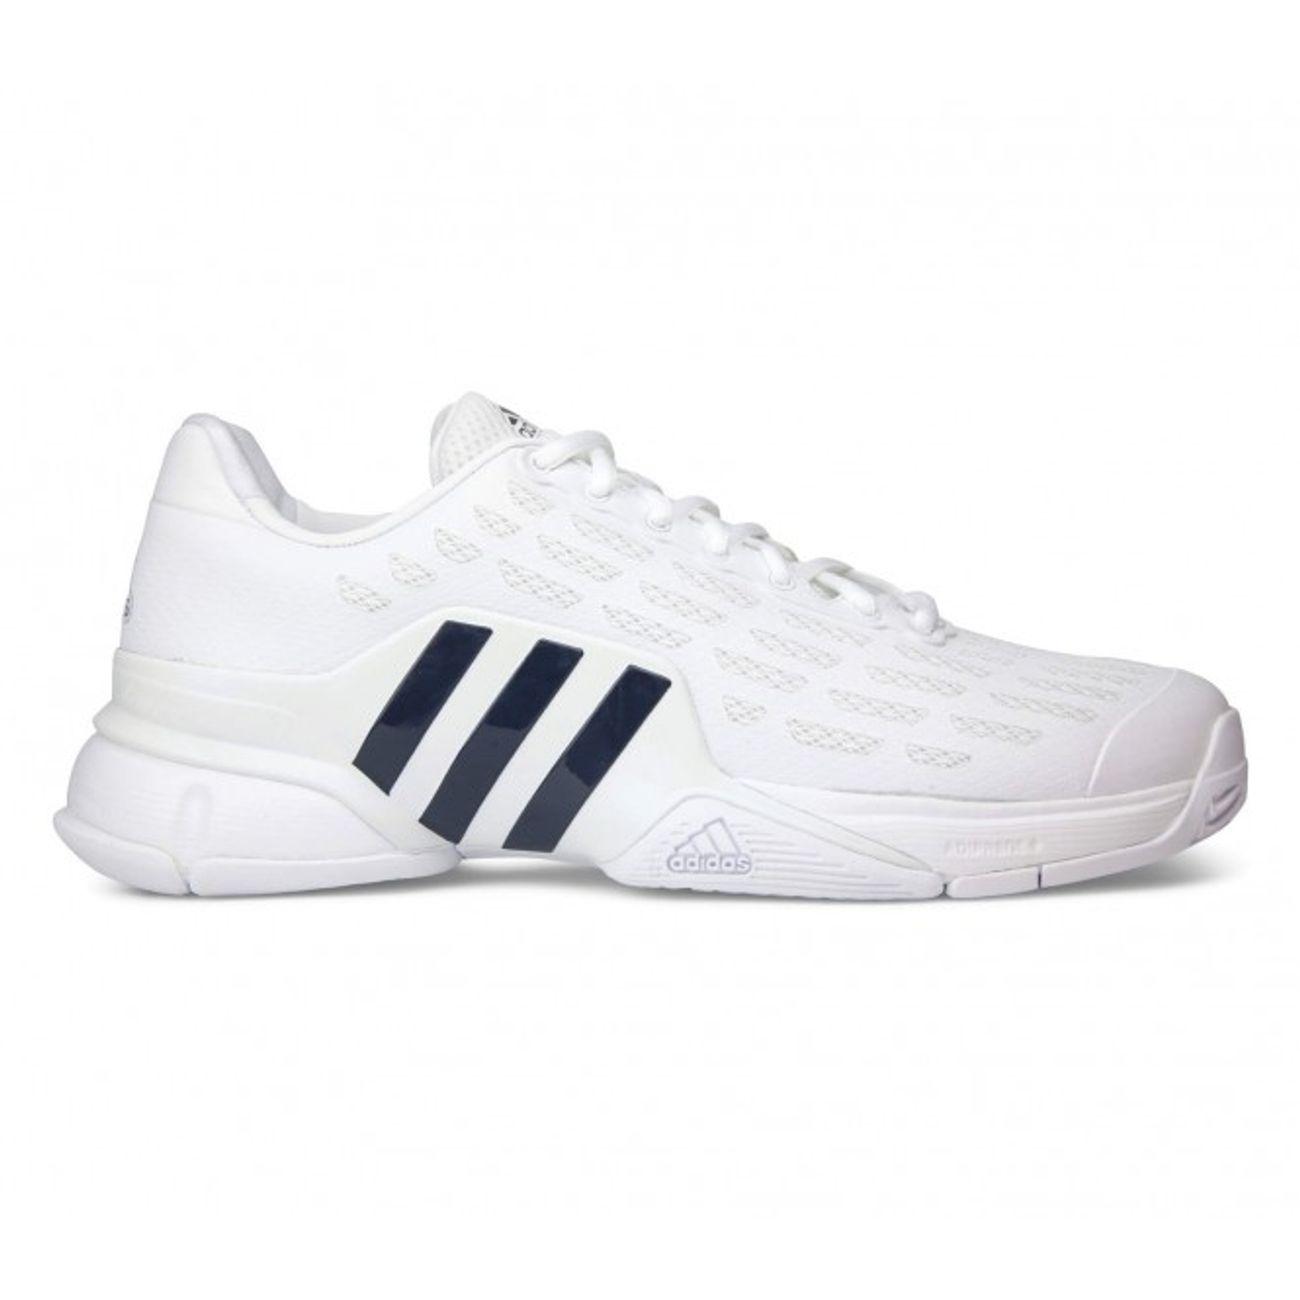 Chaussure De Tennisblancnoir Adidas 2016 Barricade Hommes E2IWH9DY